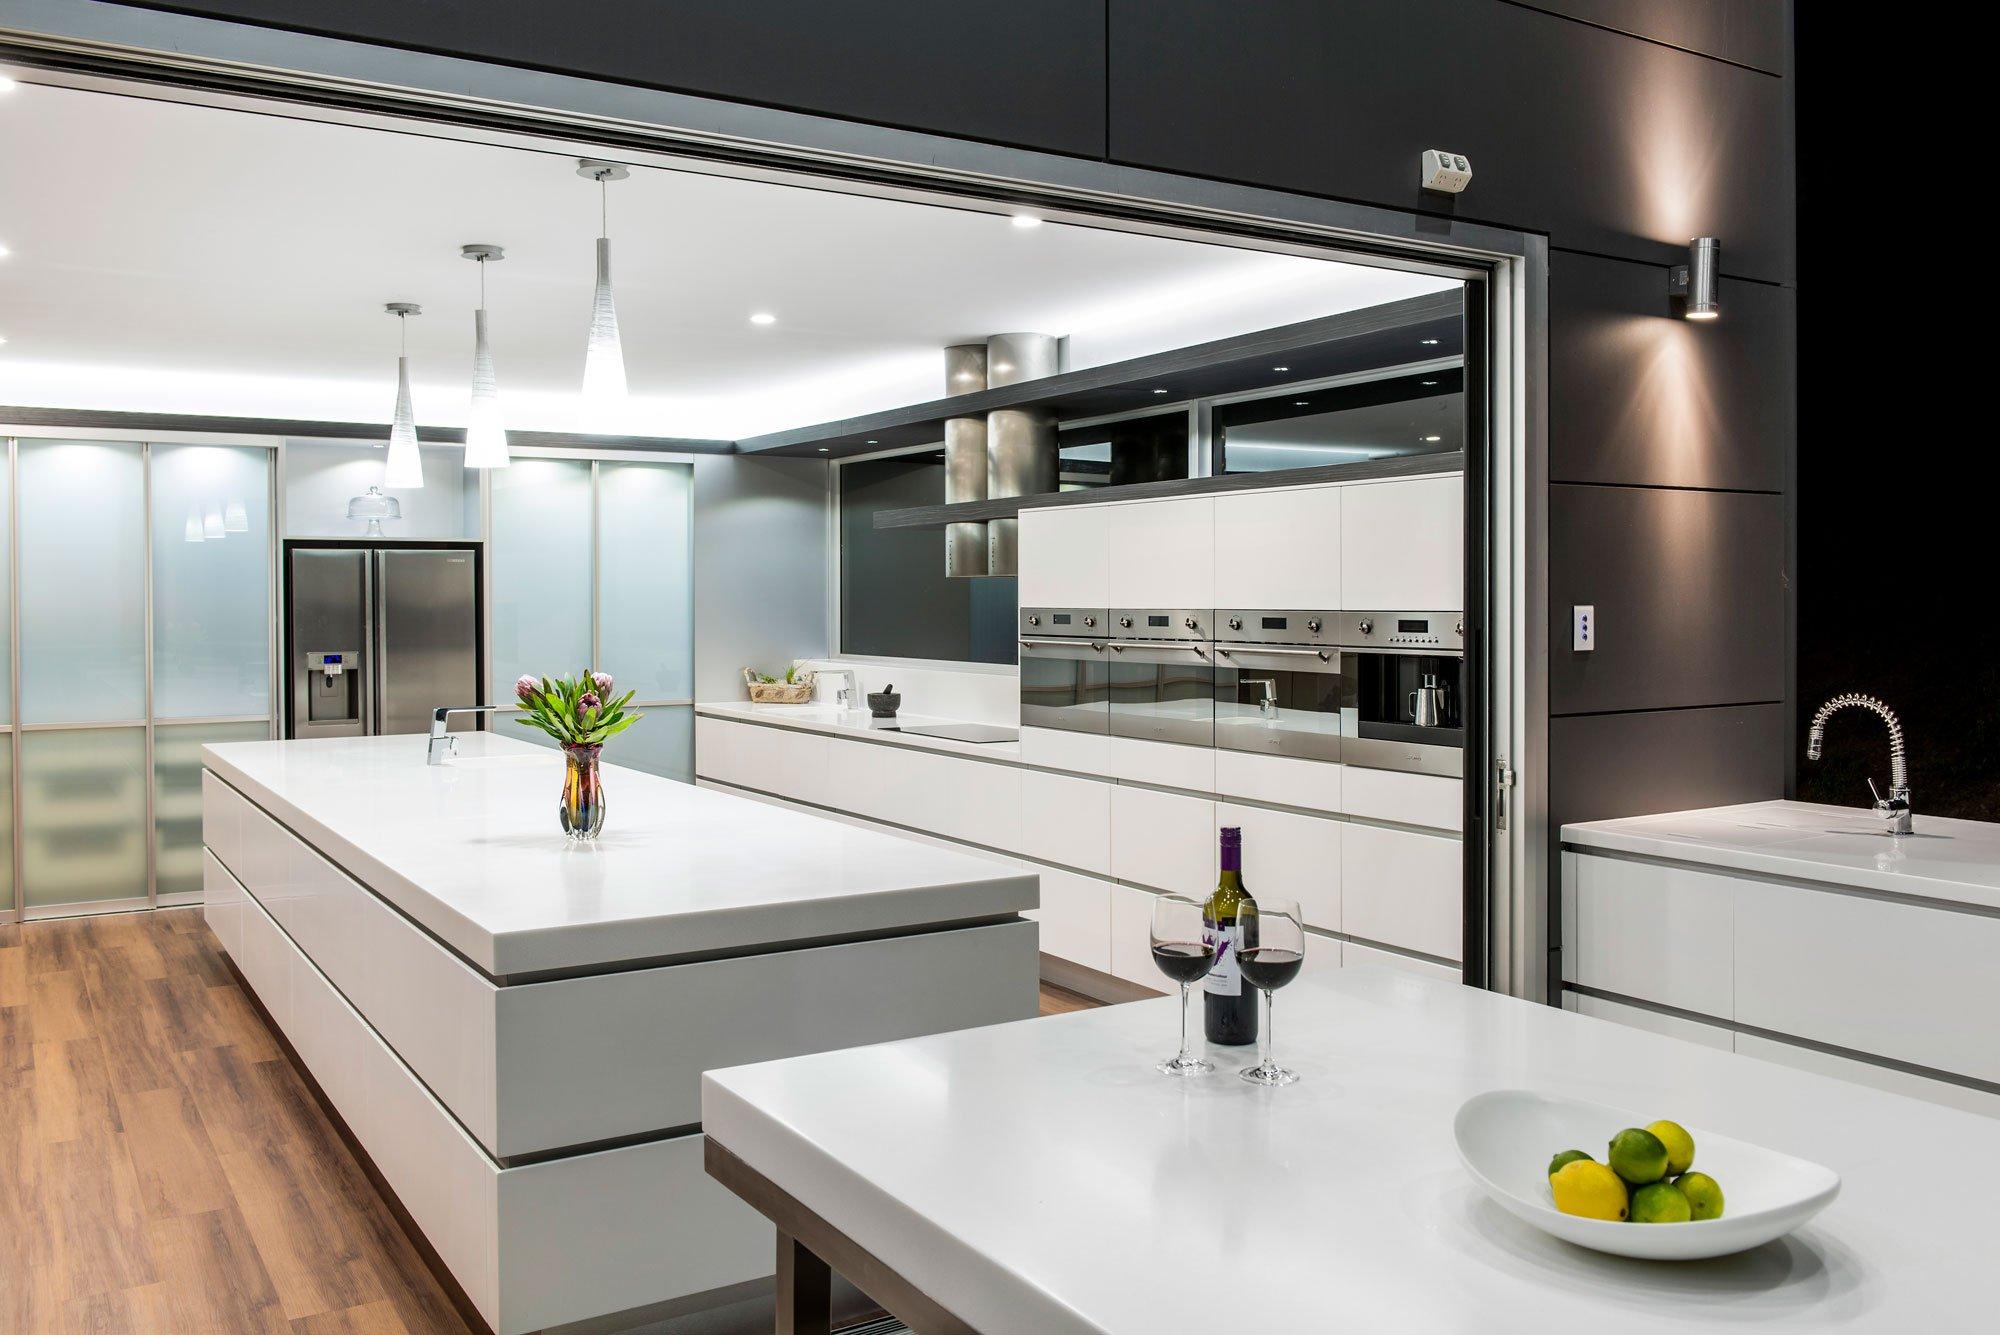 designer kitchen in samfordkim duffin of sublime architectural